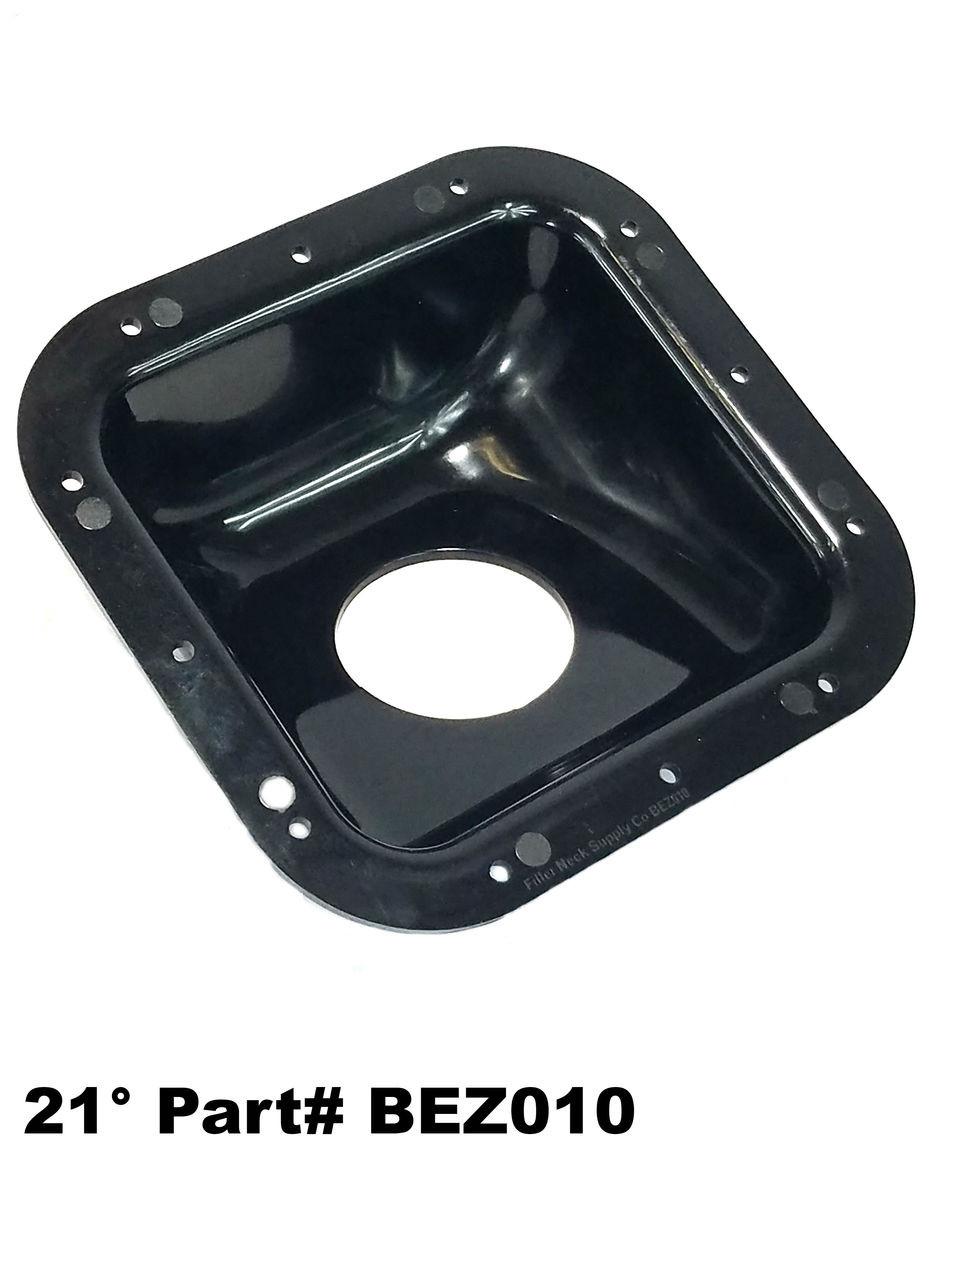 medium resolution of square plastic fuel filler neck protector dish bezel 21 degree housing bez010 frdf4tz